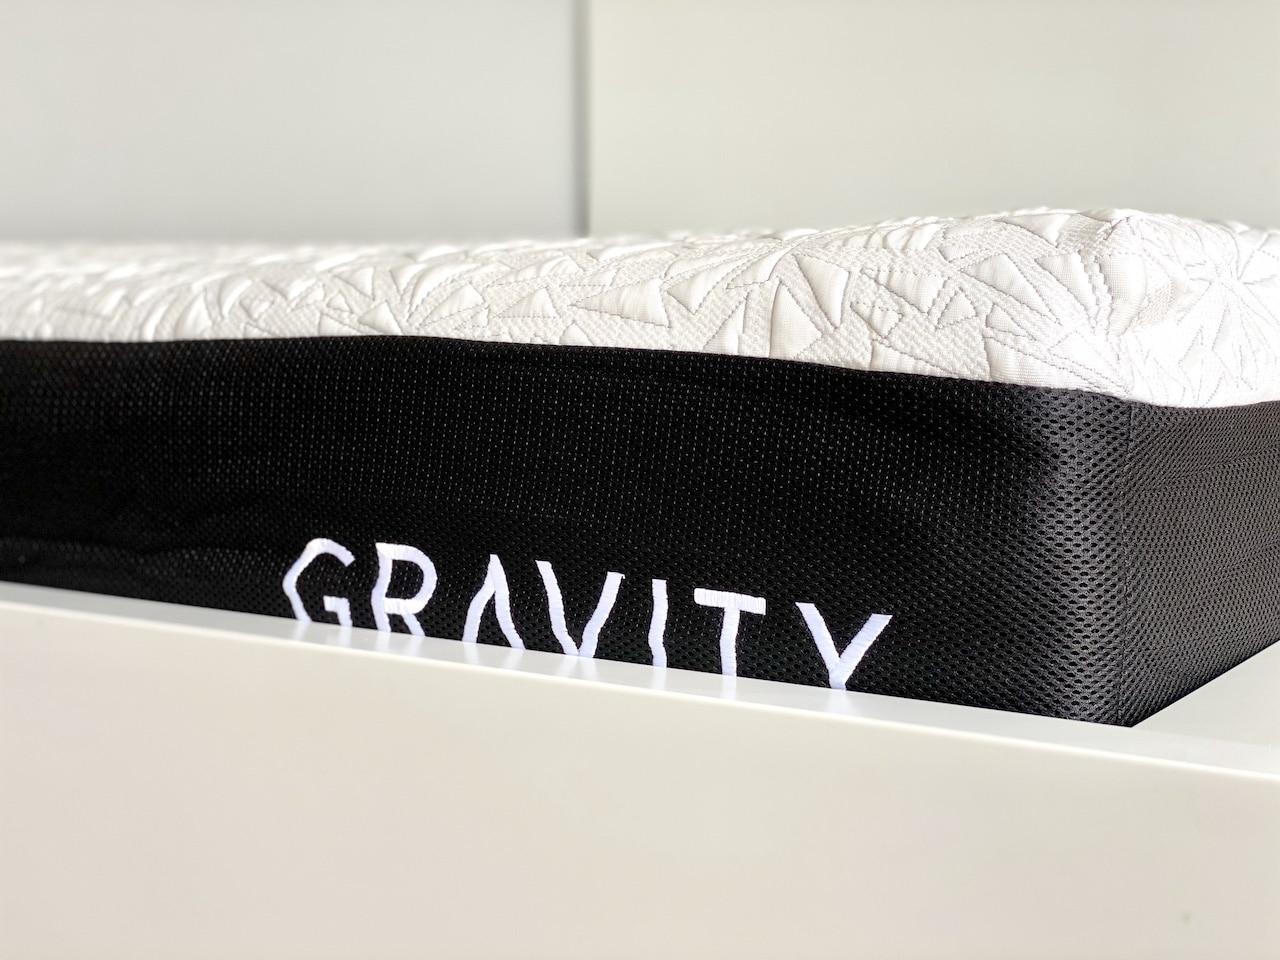 Gravity Ice Hybrid mattress review